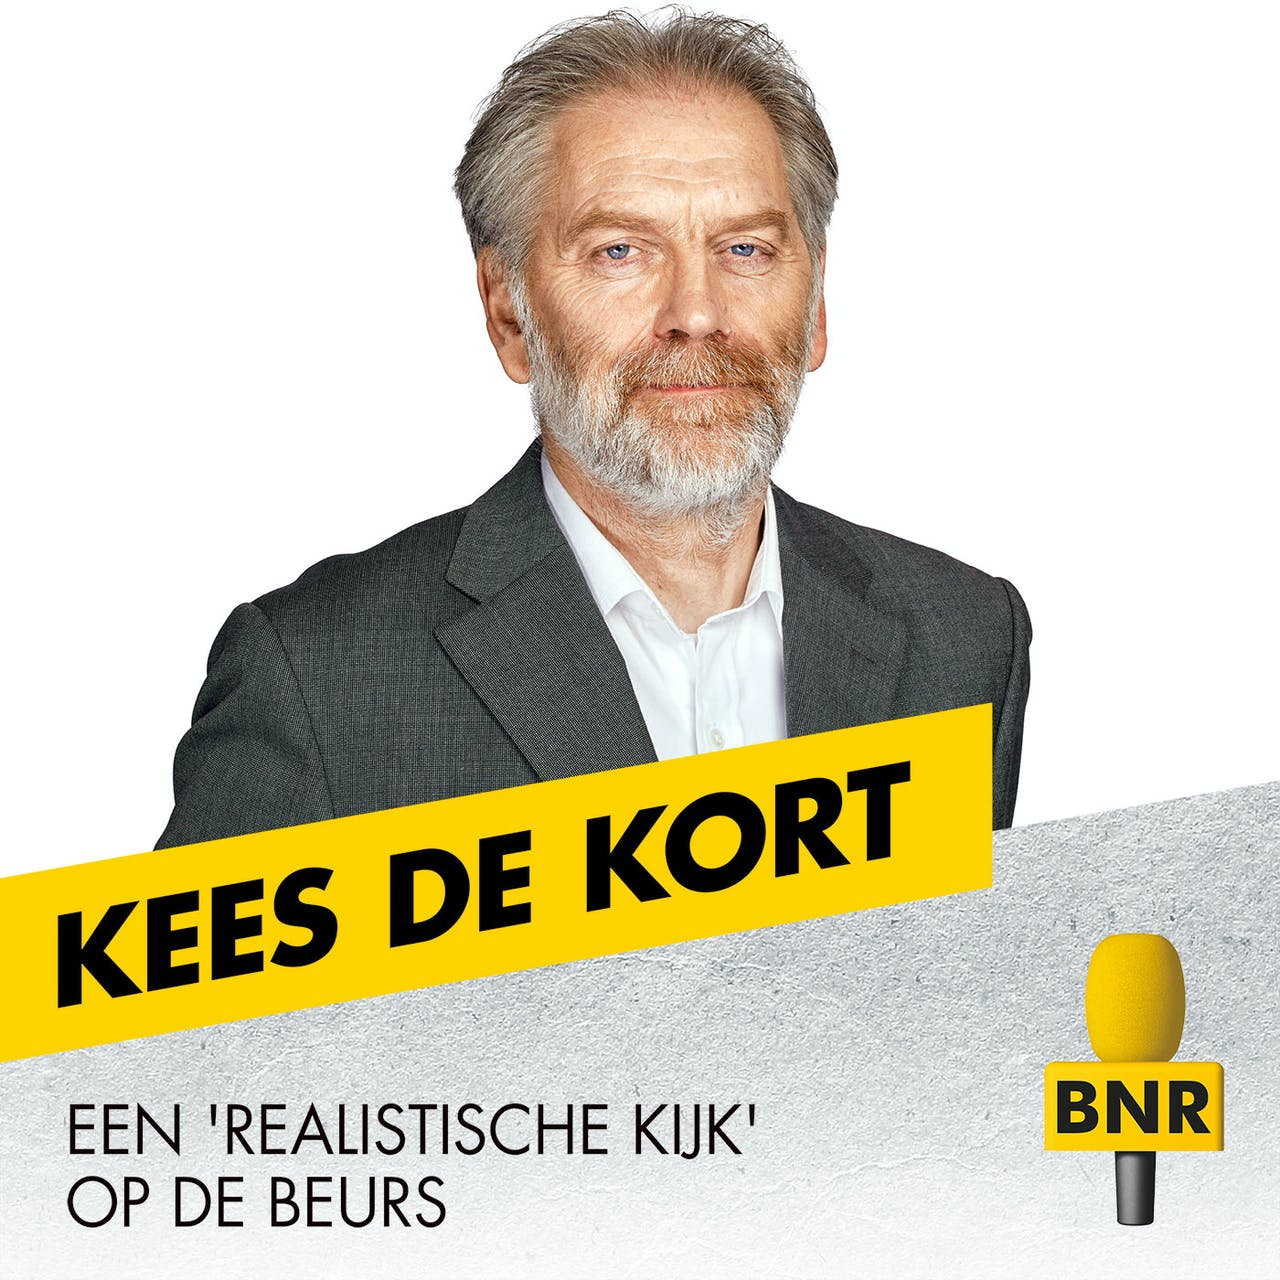 Beeld: BNR